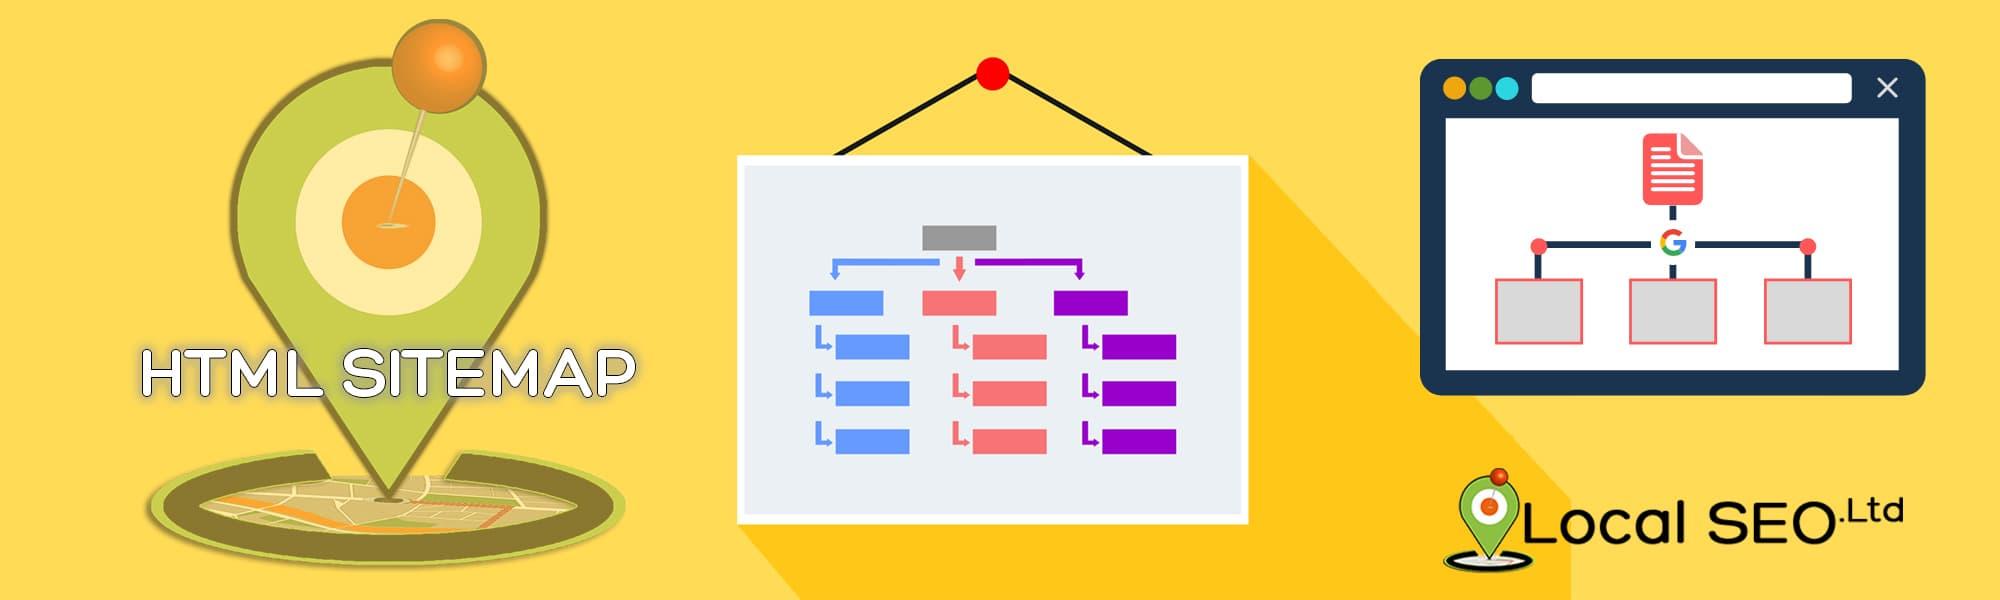 HTML Sitemap Header